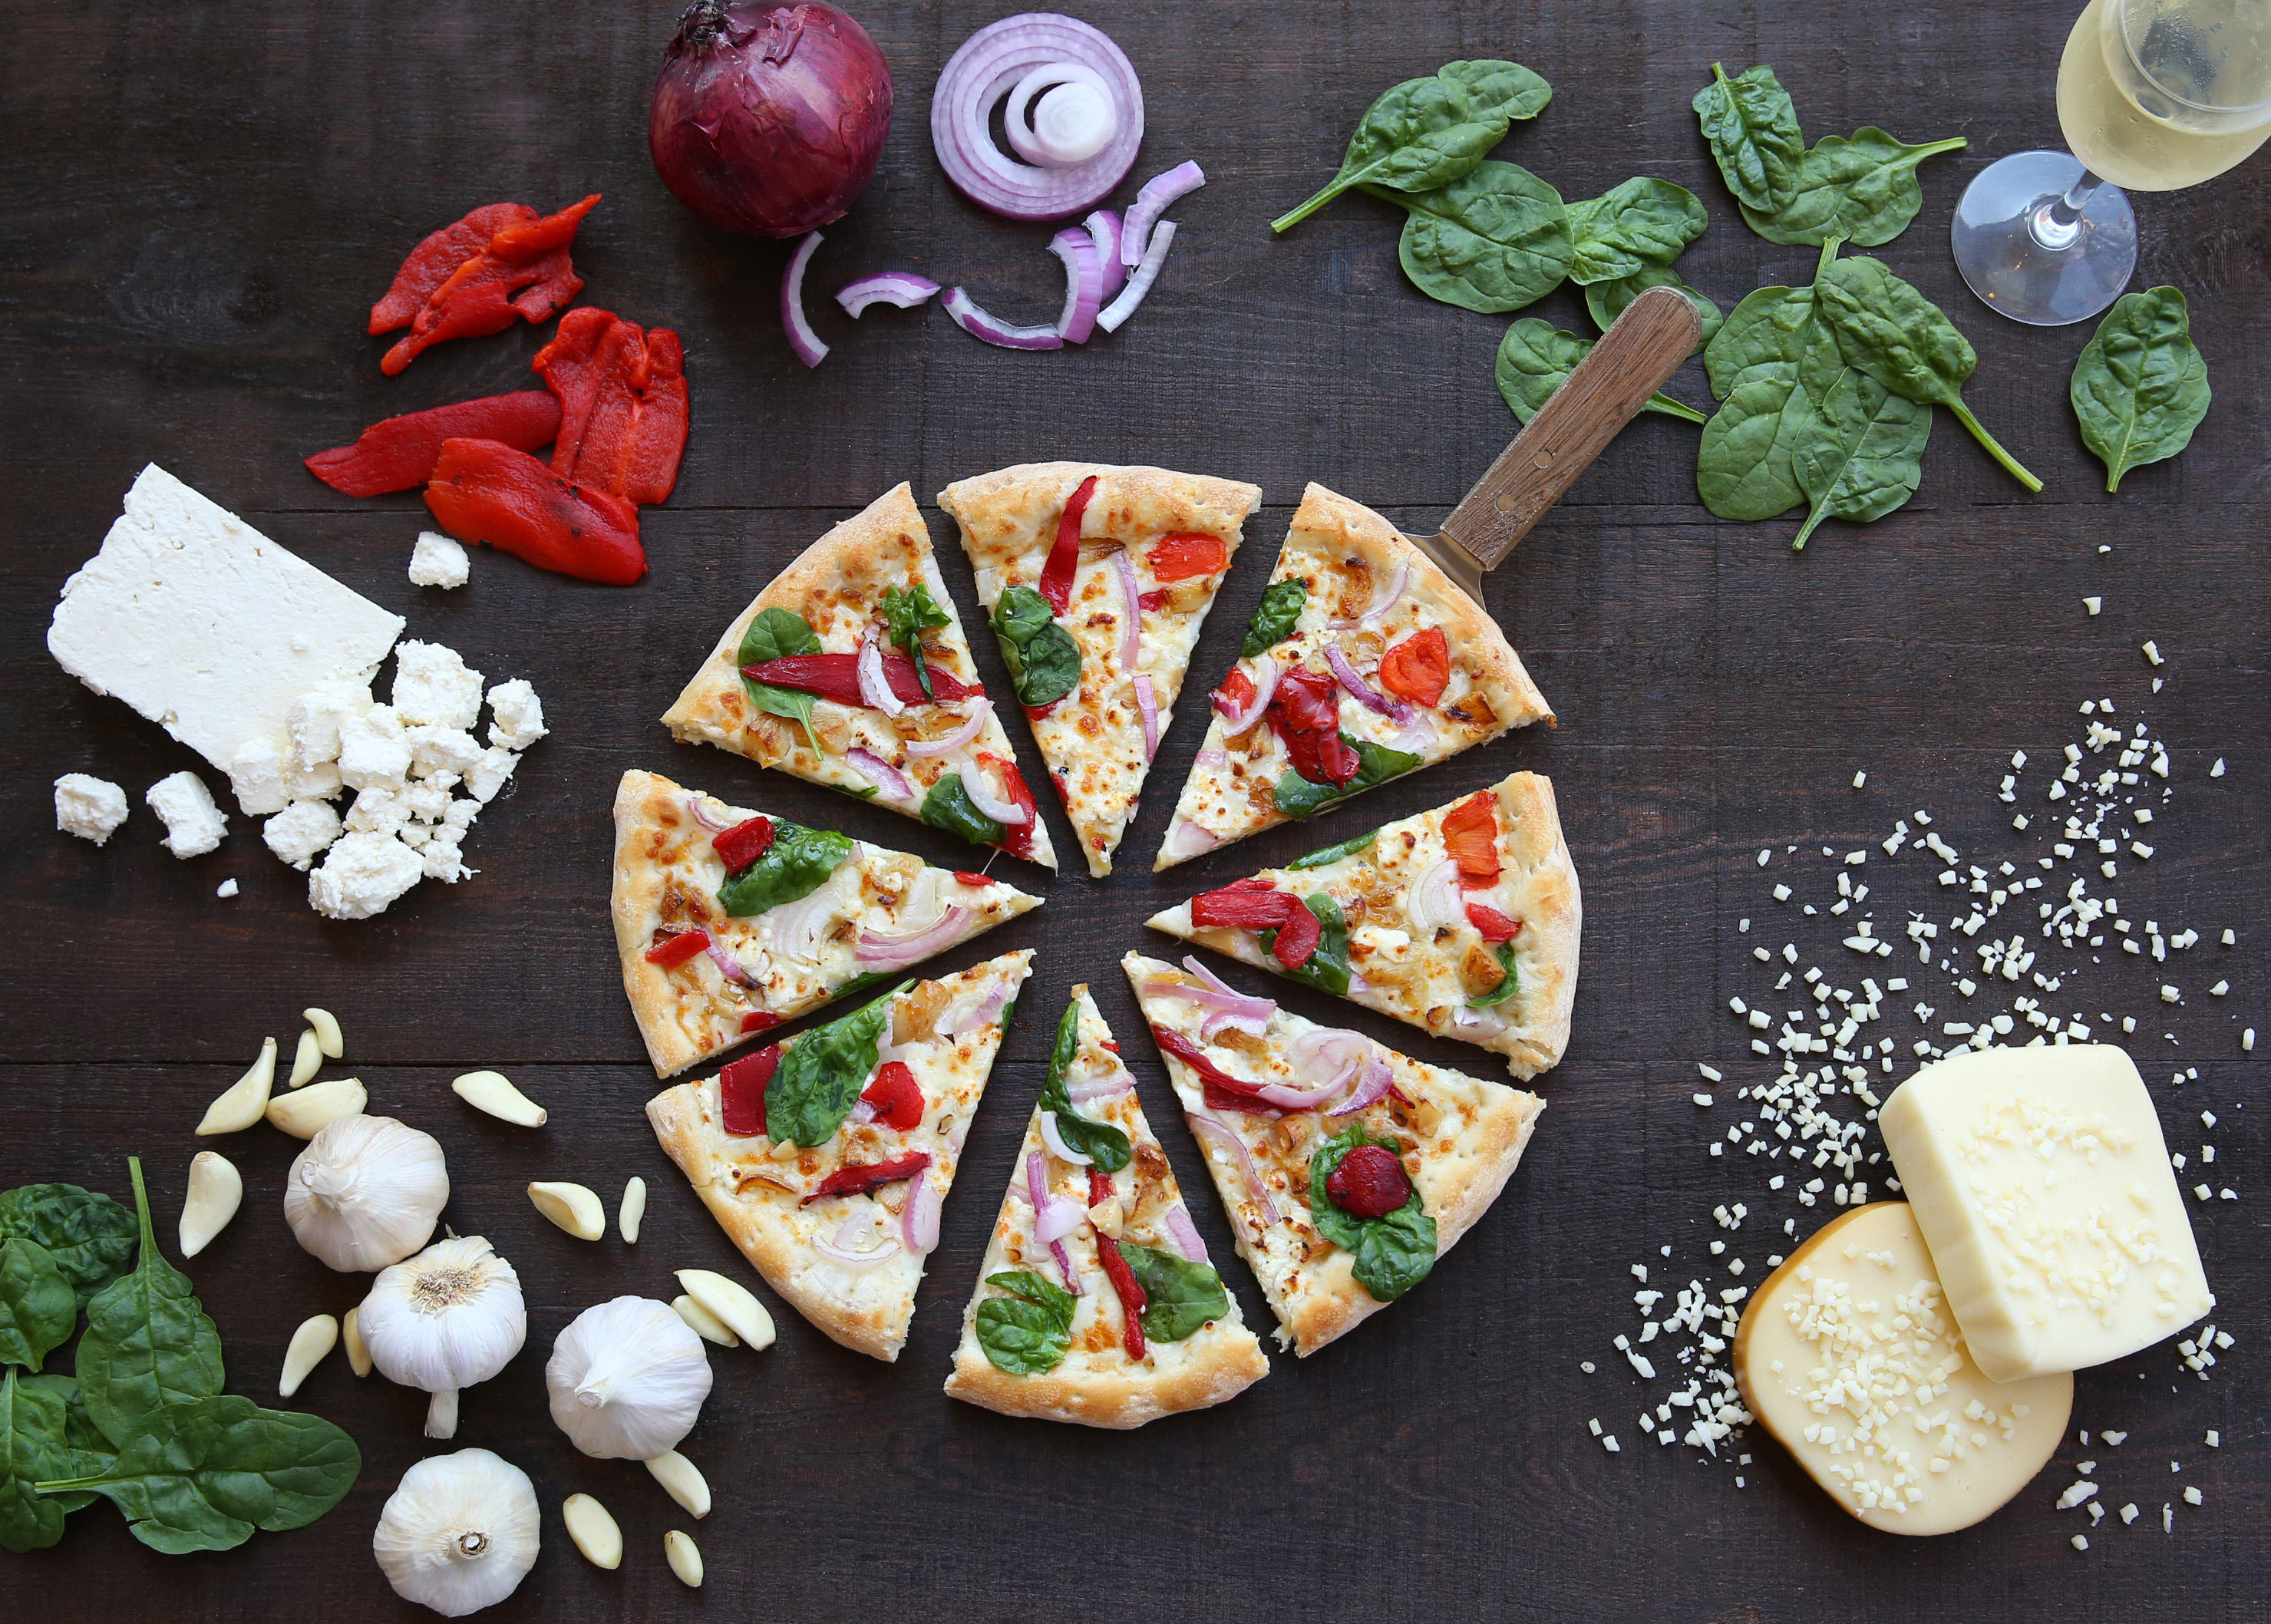 Rotolo's Pizzeria image 11